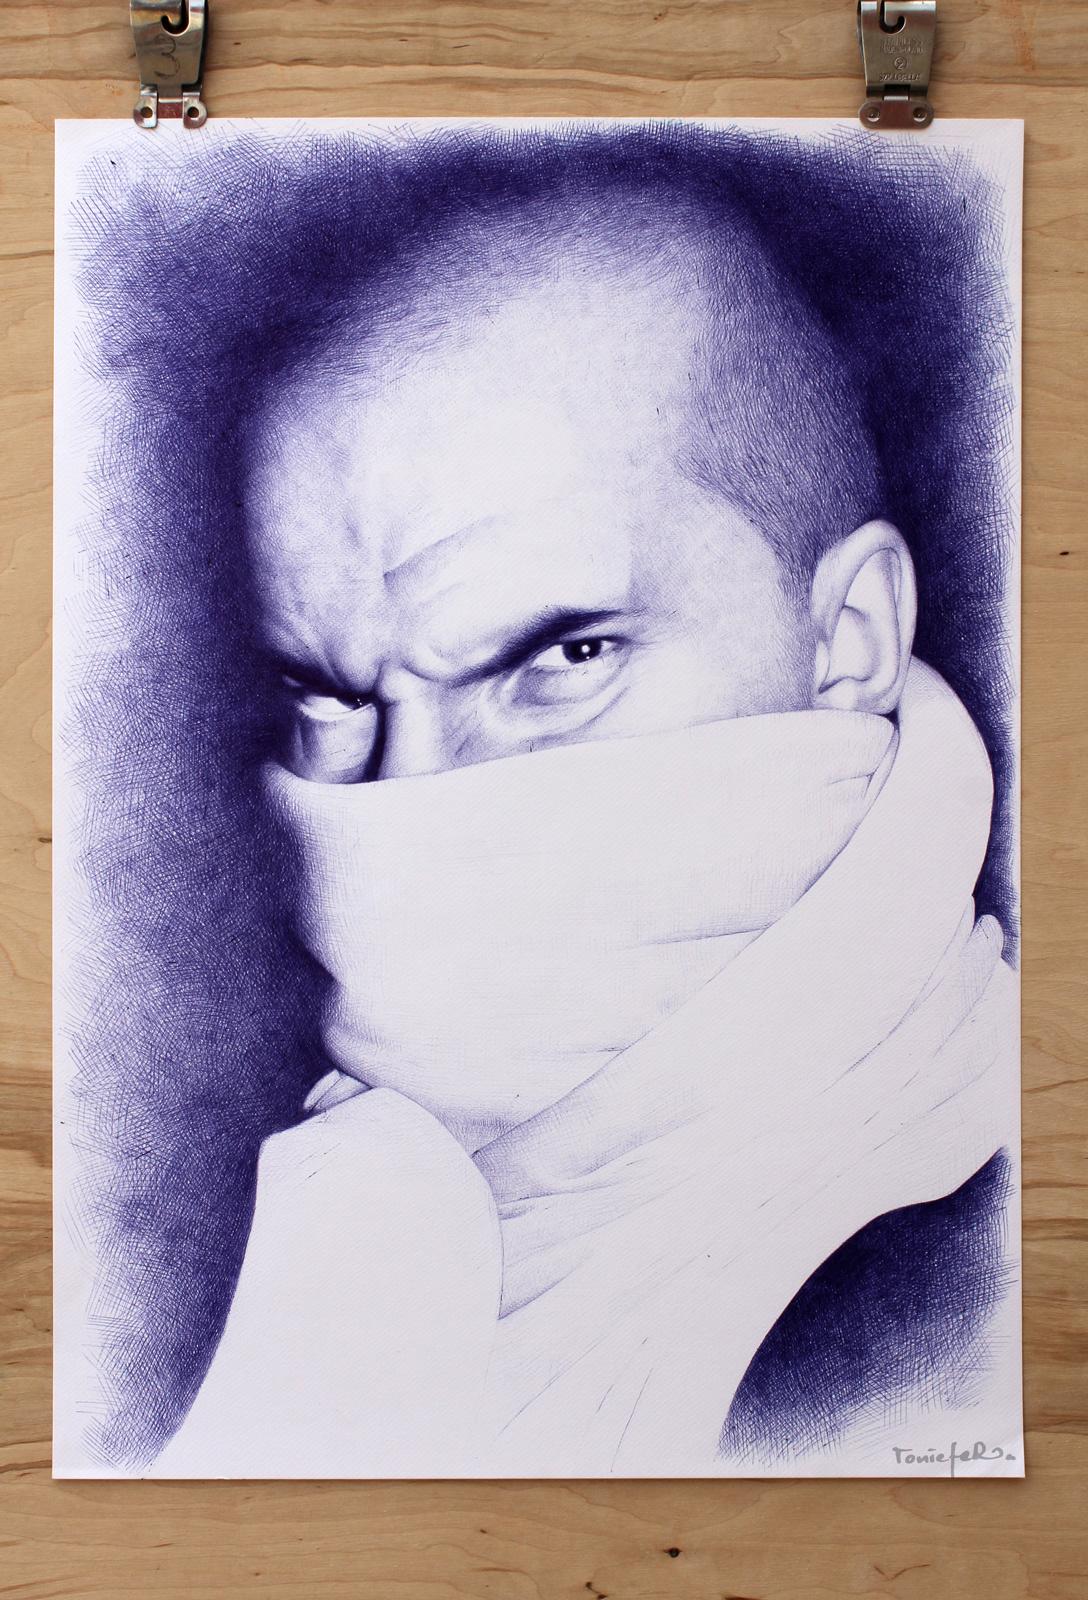 ballpoint pen on paper - ToniEfer